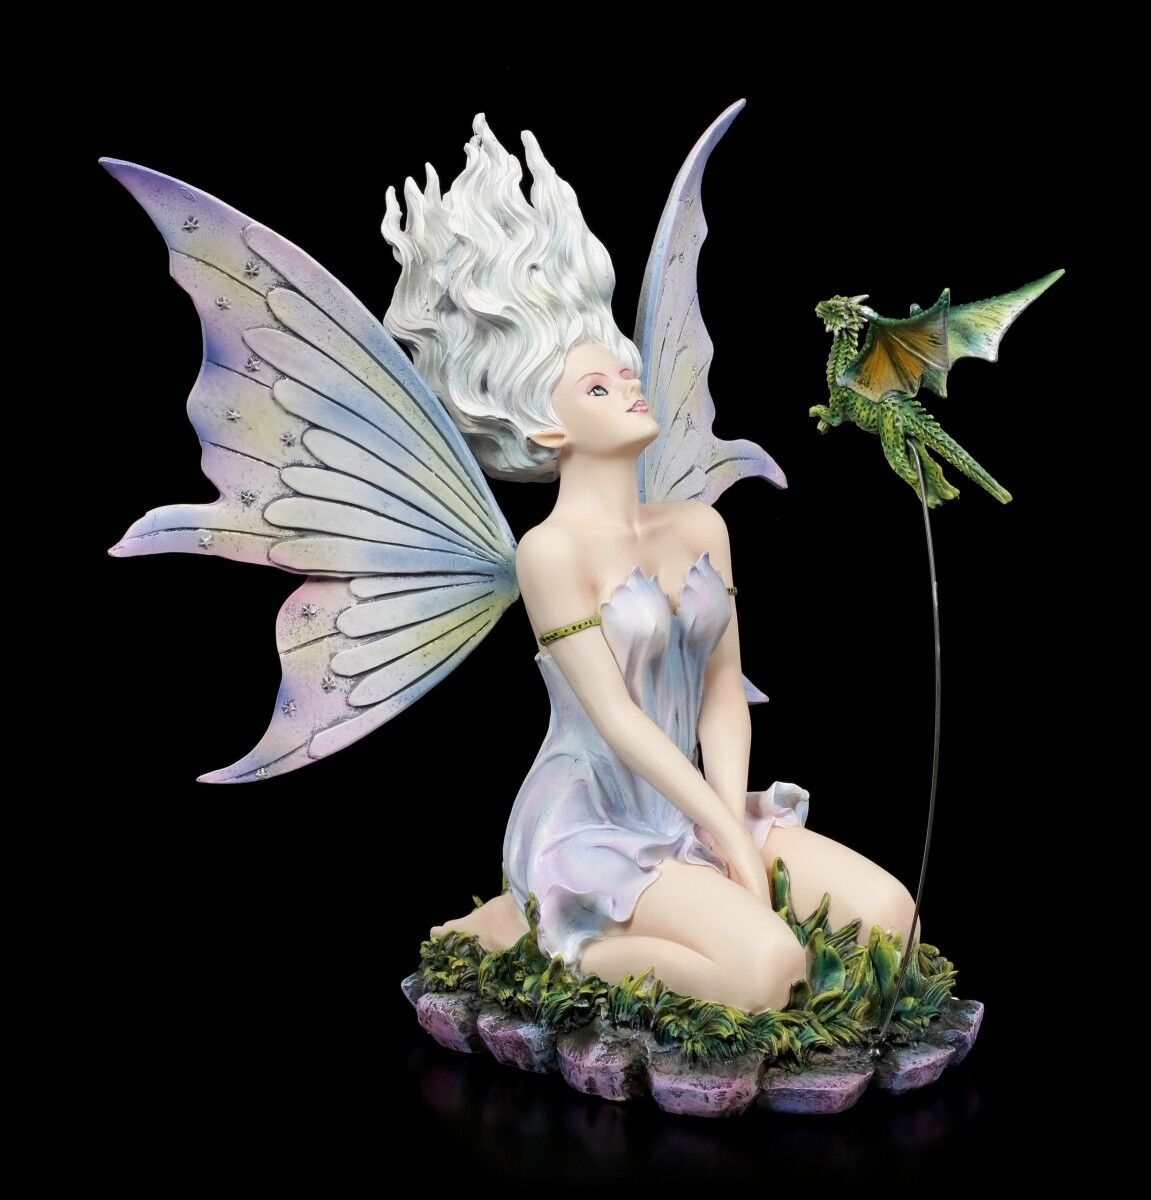 Figura Elfos - Velda Arrodillado con Dragón - Fantasy Hada Elfendeko Dekostatue